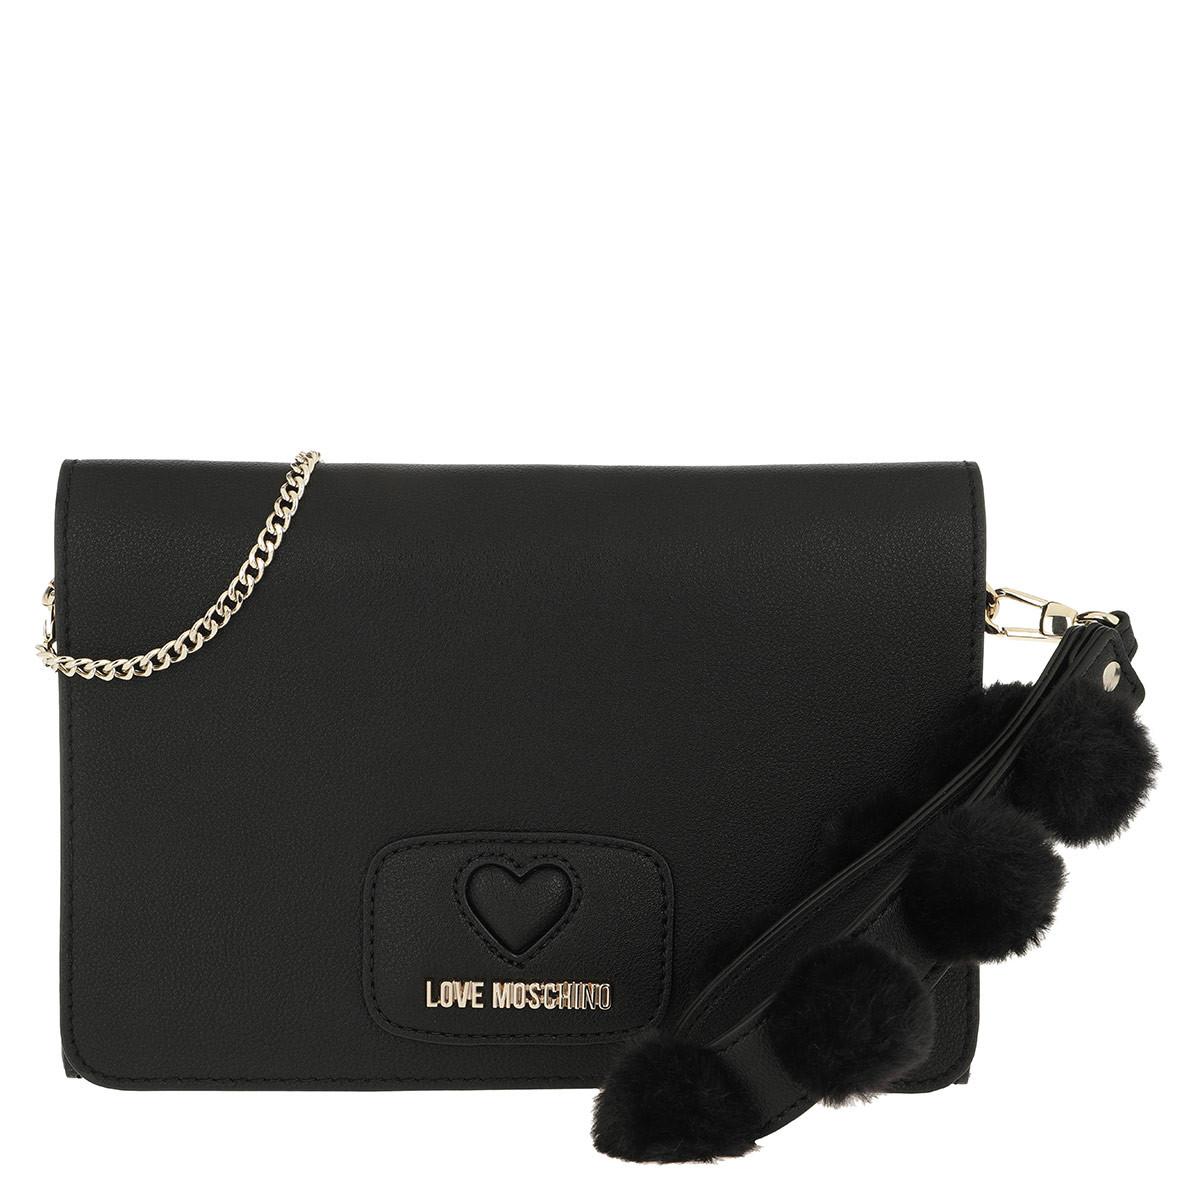 Love Moschino Clutch - Pom Pom Clutch Black - in schwarz - für Damen